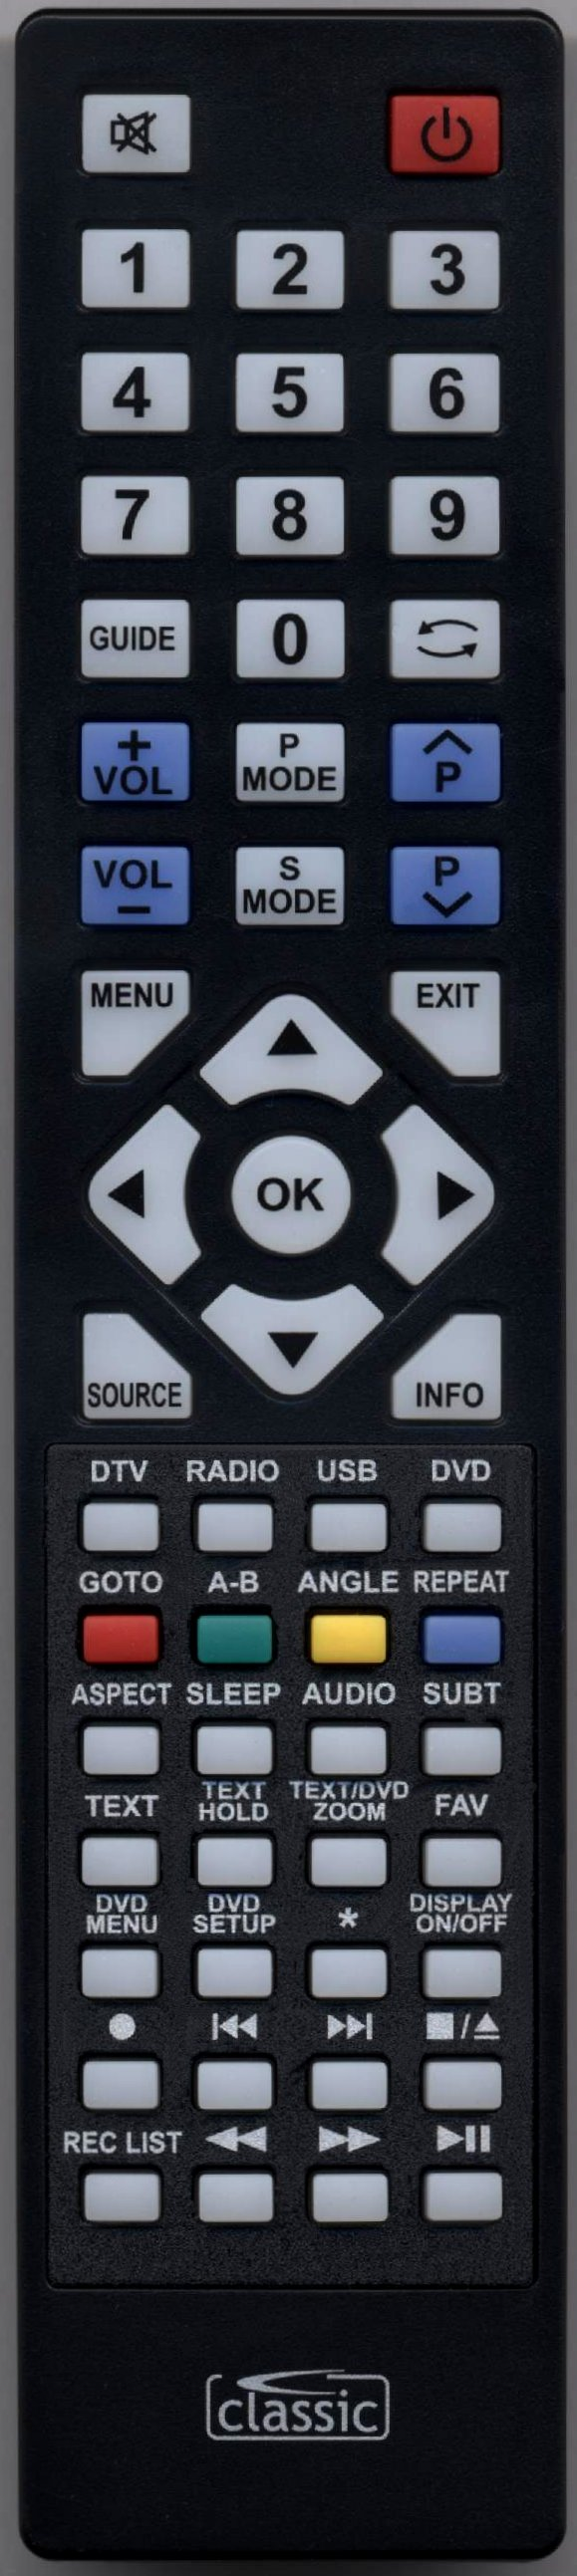 Blaupunkt 32/133I-WB-11B-HDP-UK Remote Control